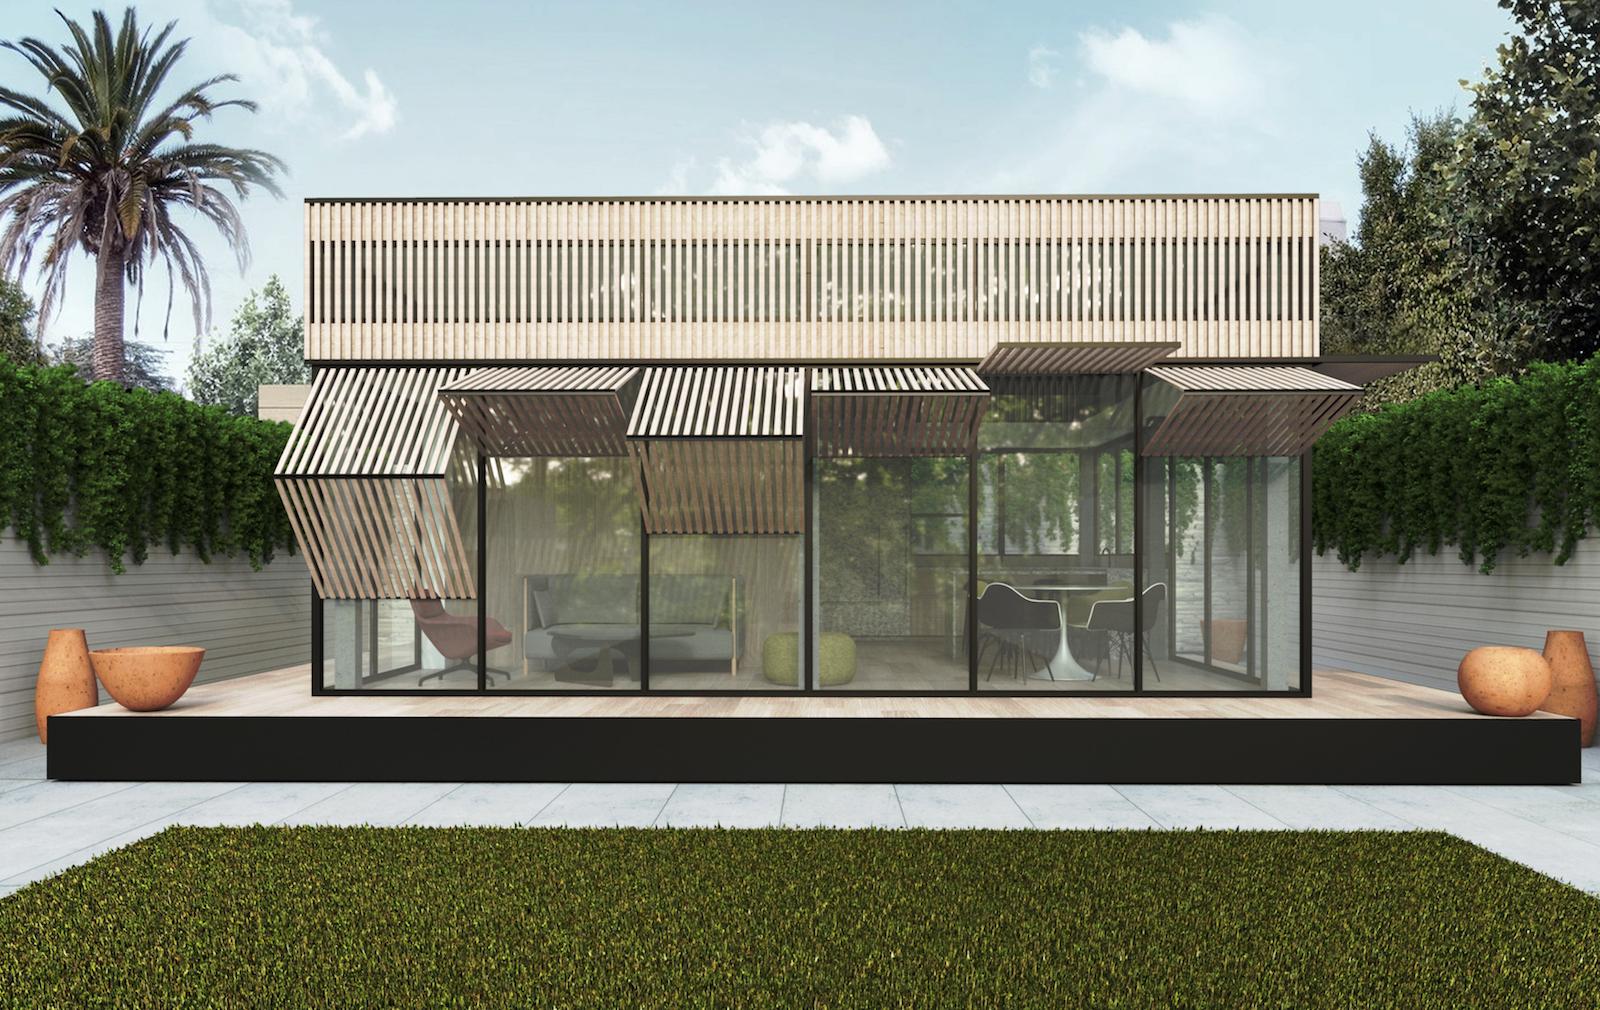 Rendering of house facade